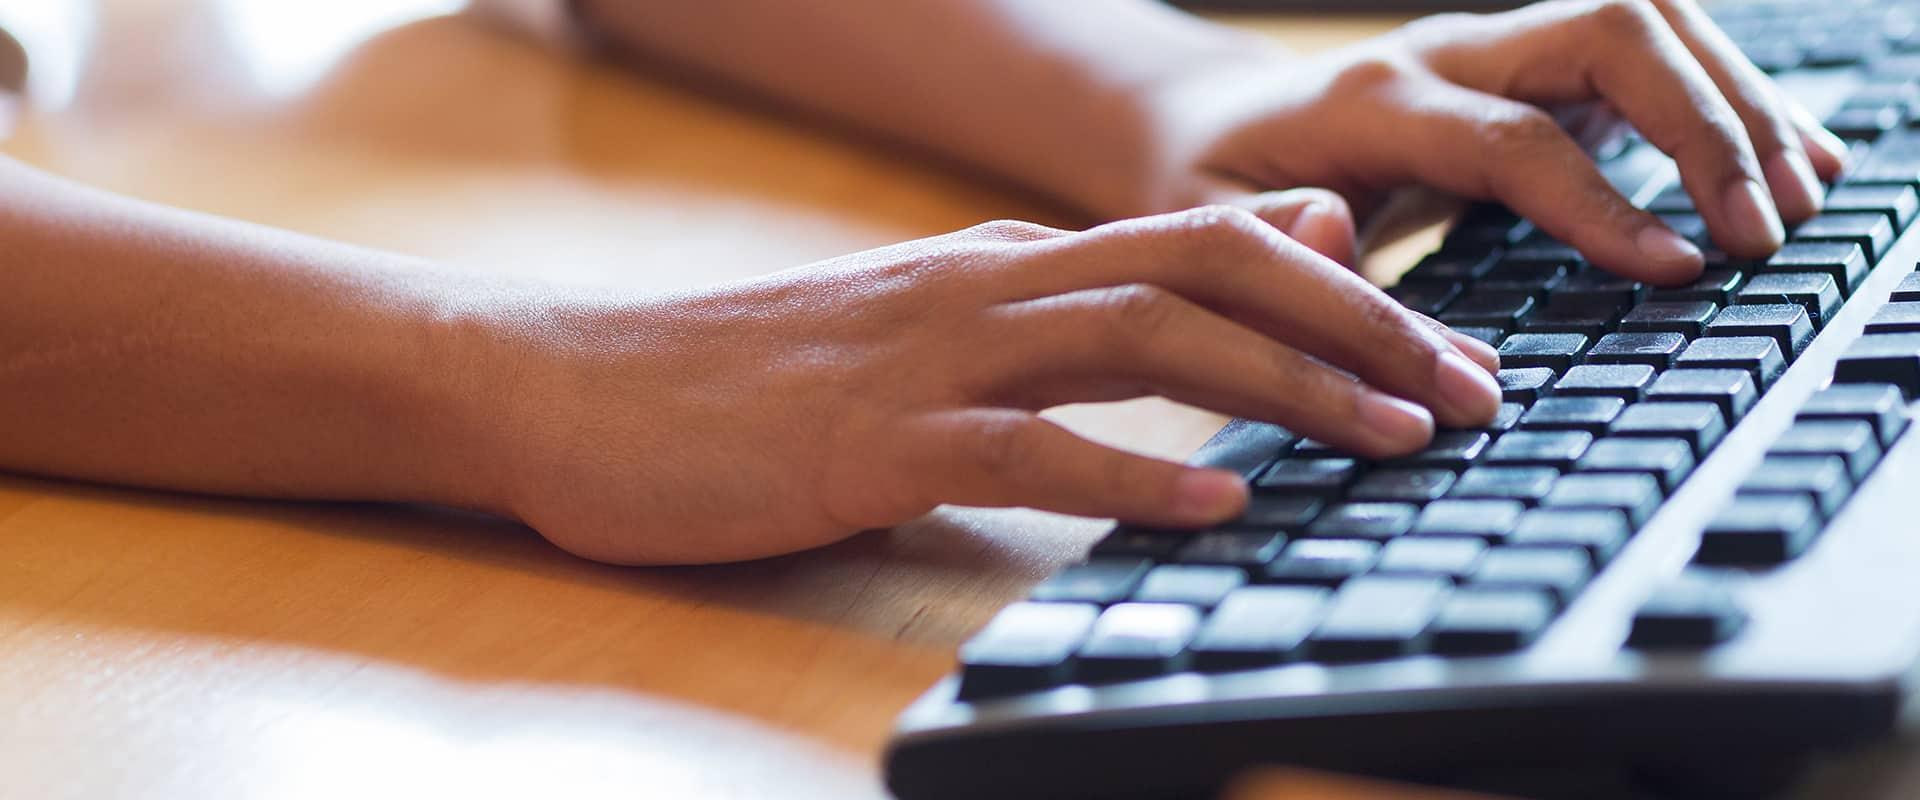 a person typing on a keyboard in kill devil hills north carolina